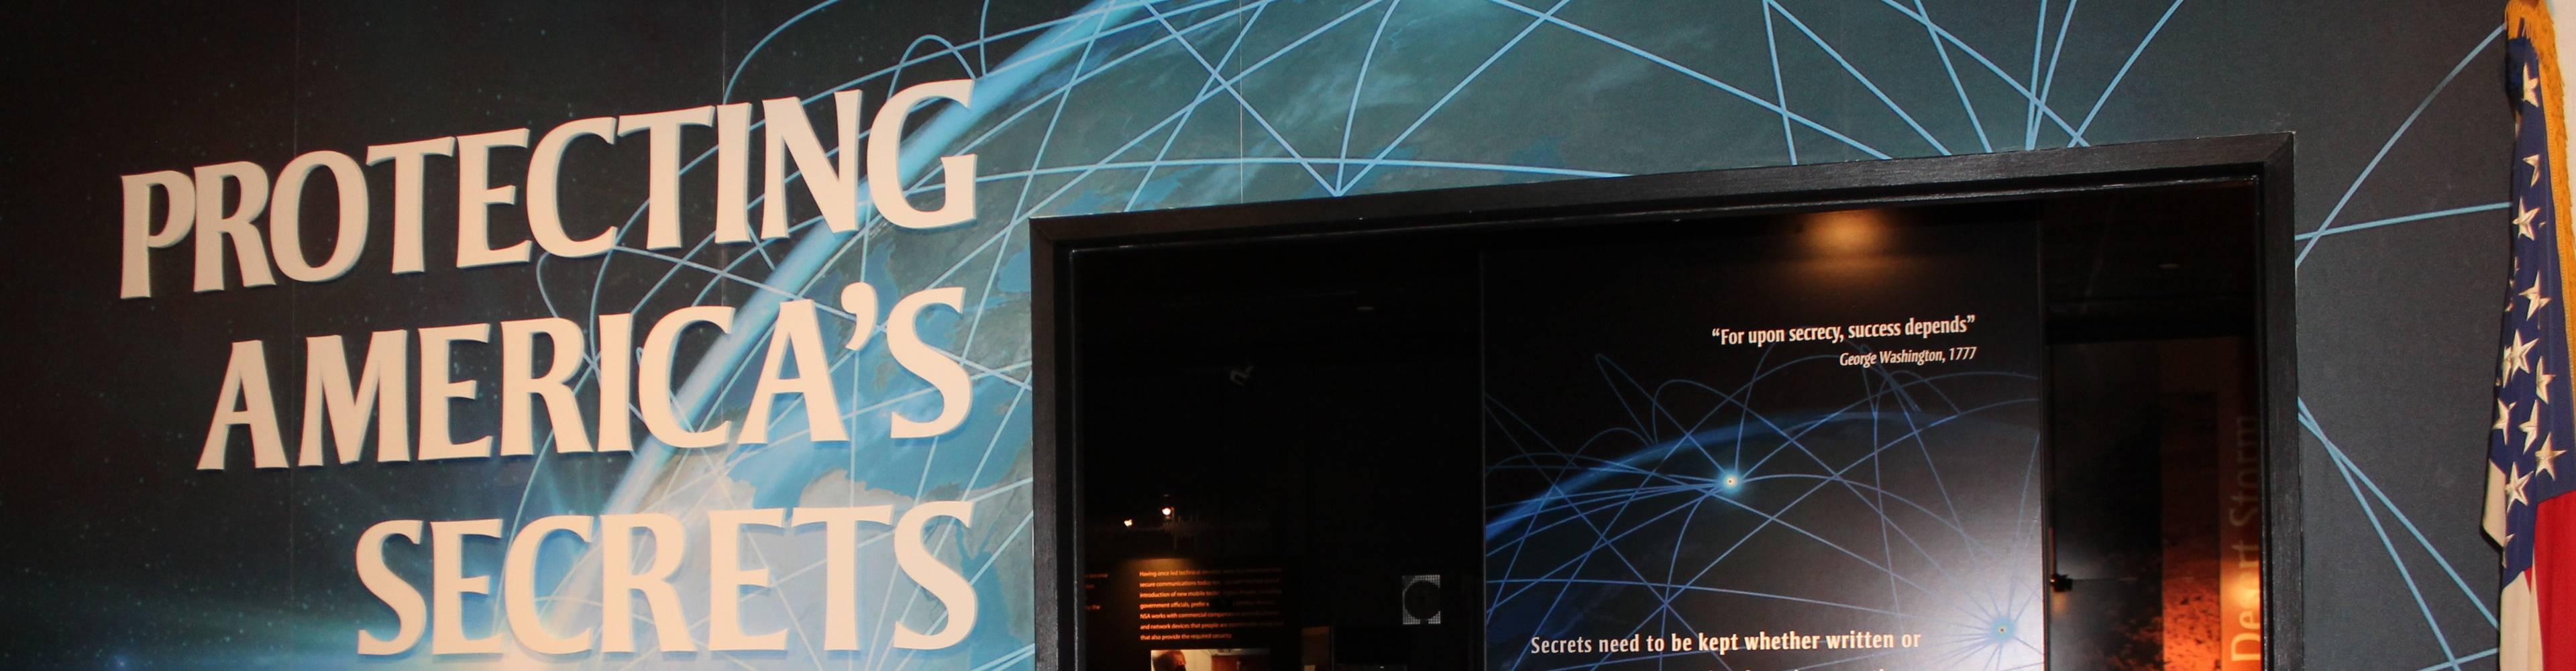 virmuze exhibit Protecting America´s Secrets logo main banner